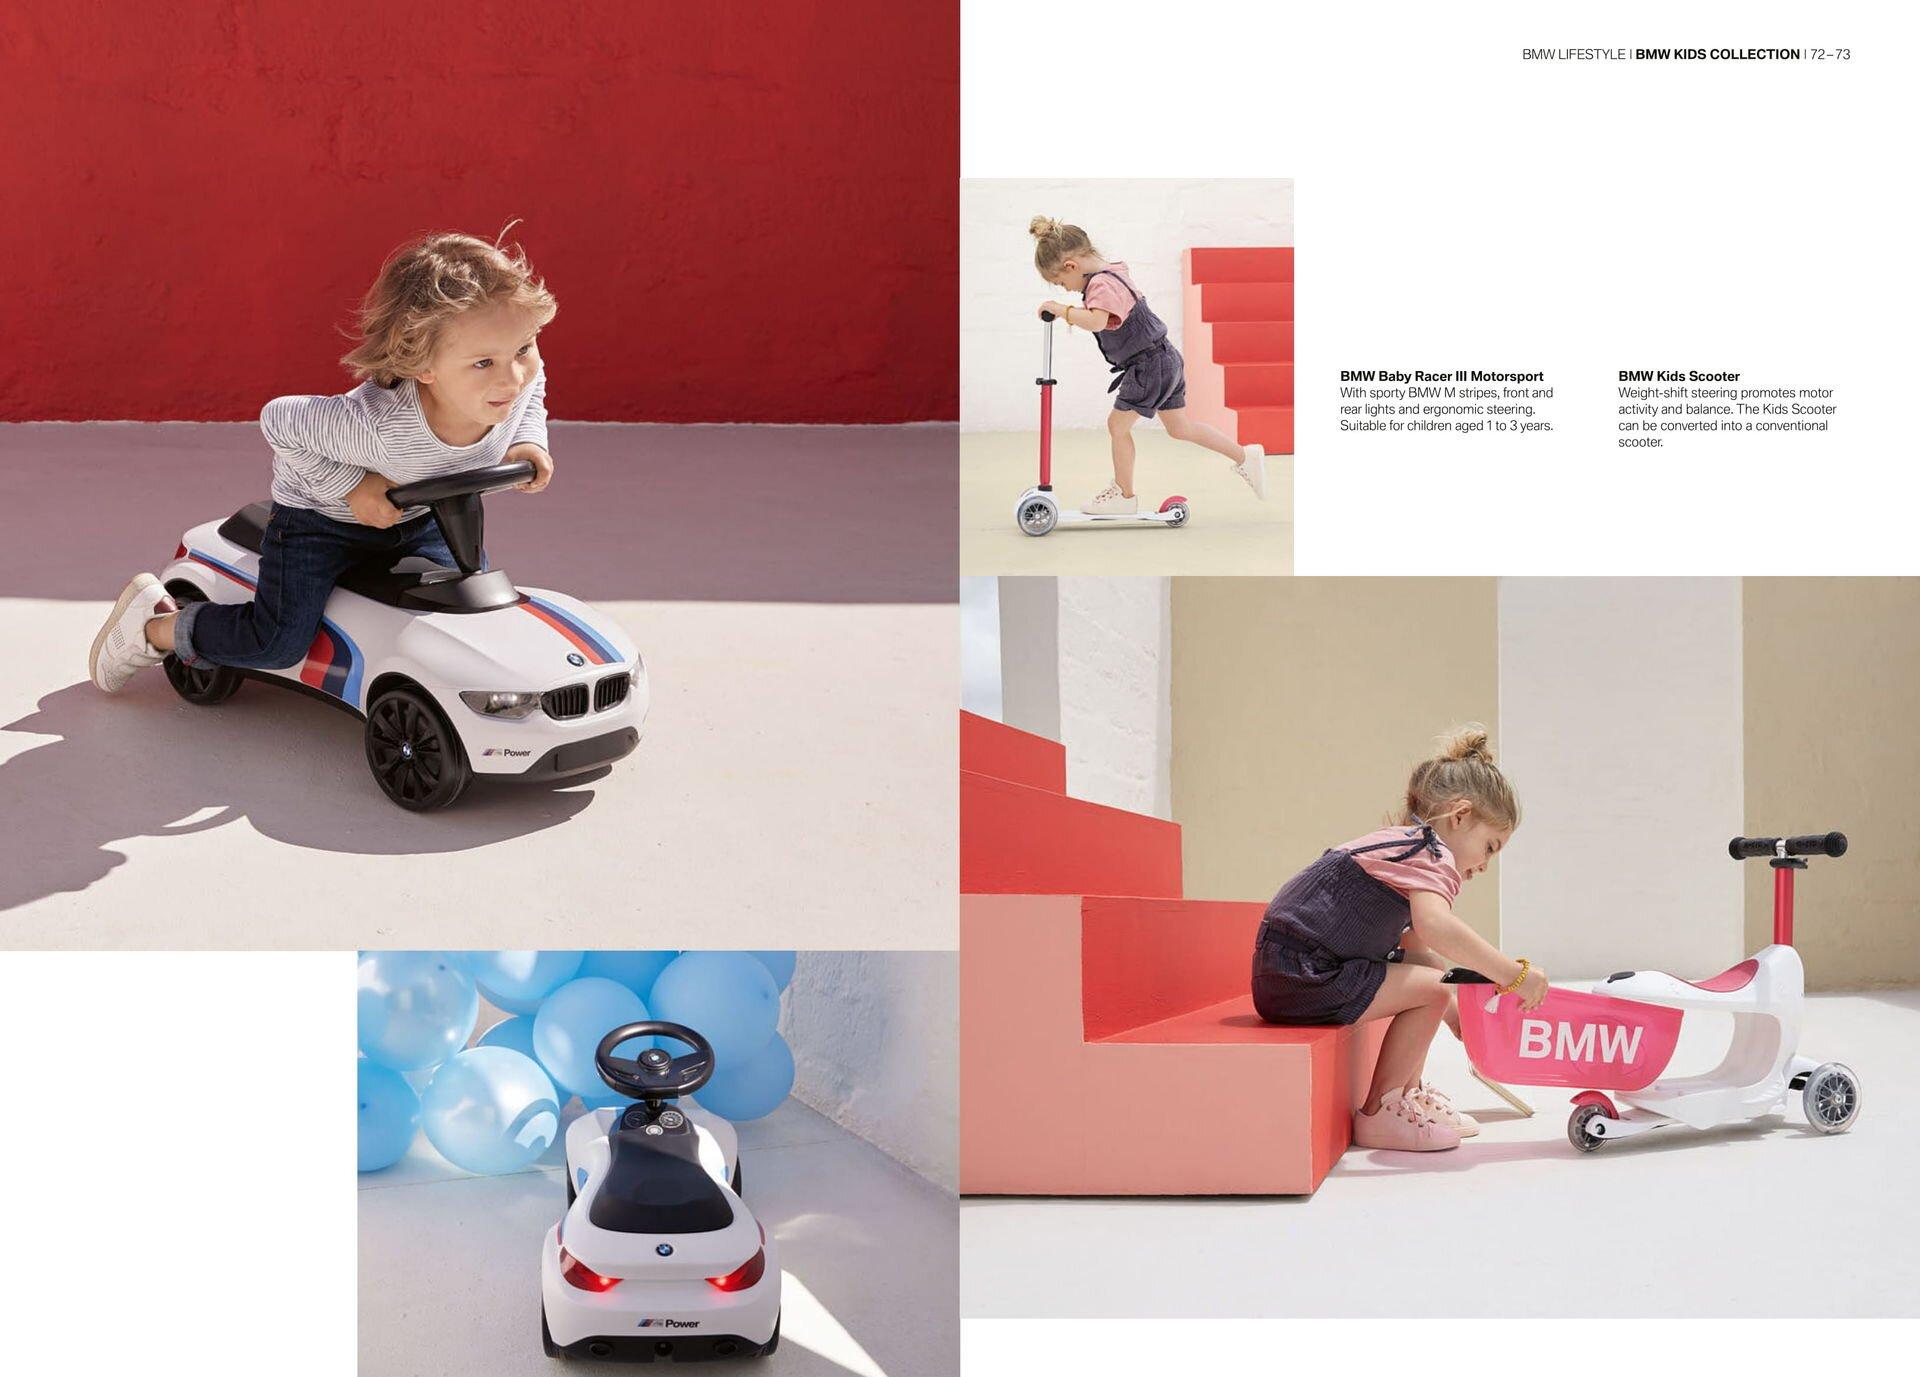 Коллекция аксессуаров BMW LIFESTYLE 2018-2020 - фото pic_c2c30c6603a989d_1920x9000_1.jpg